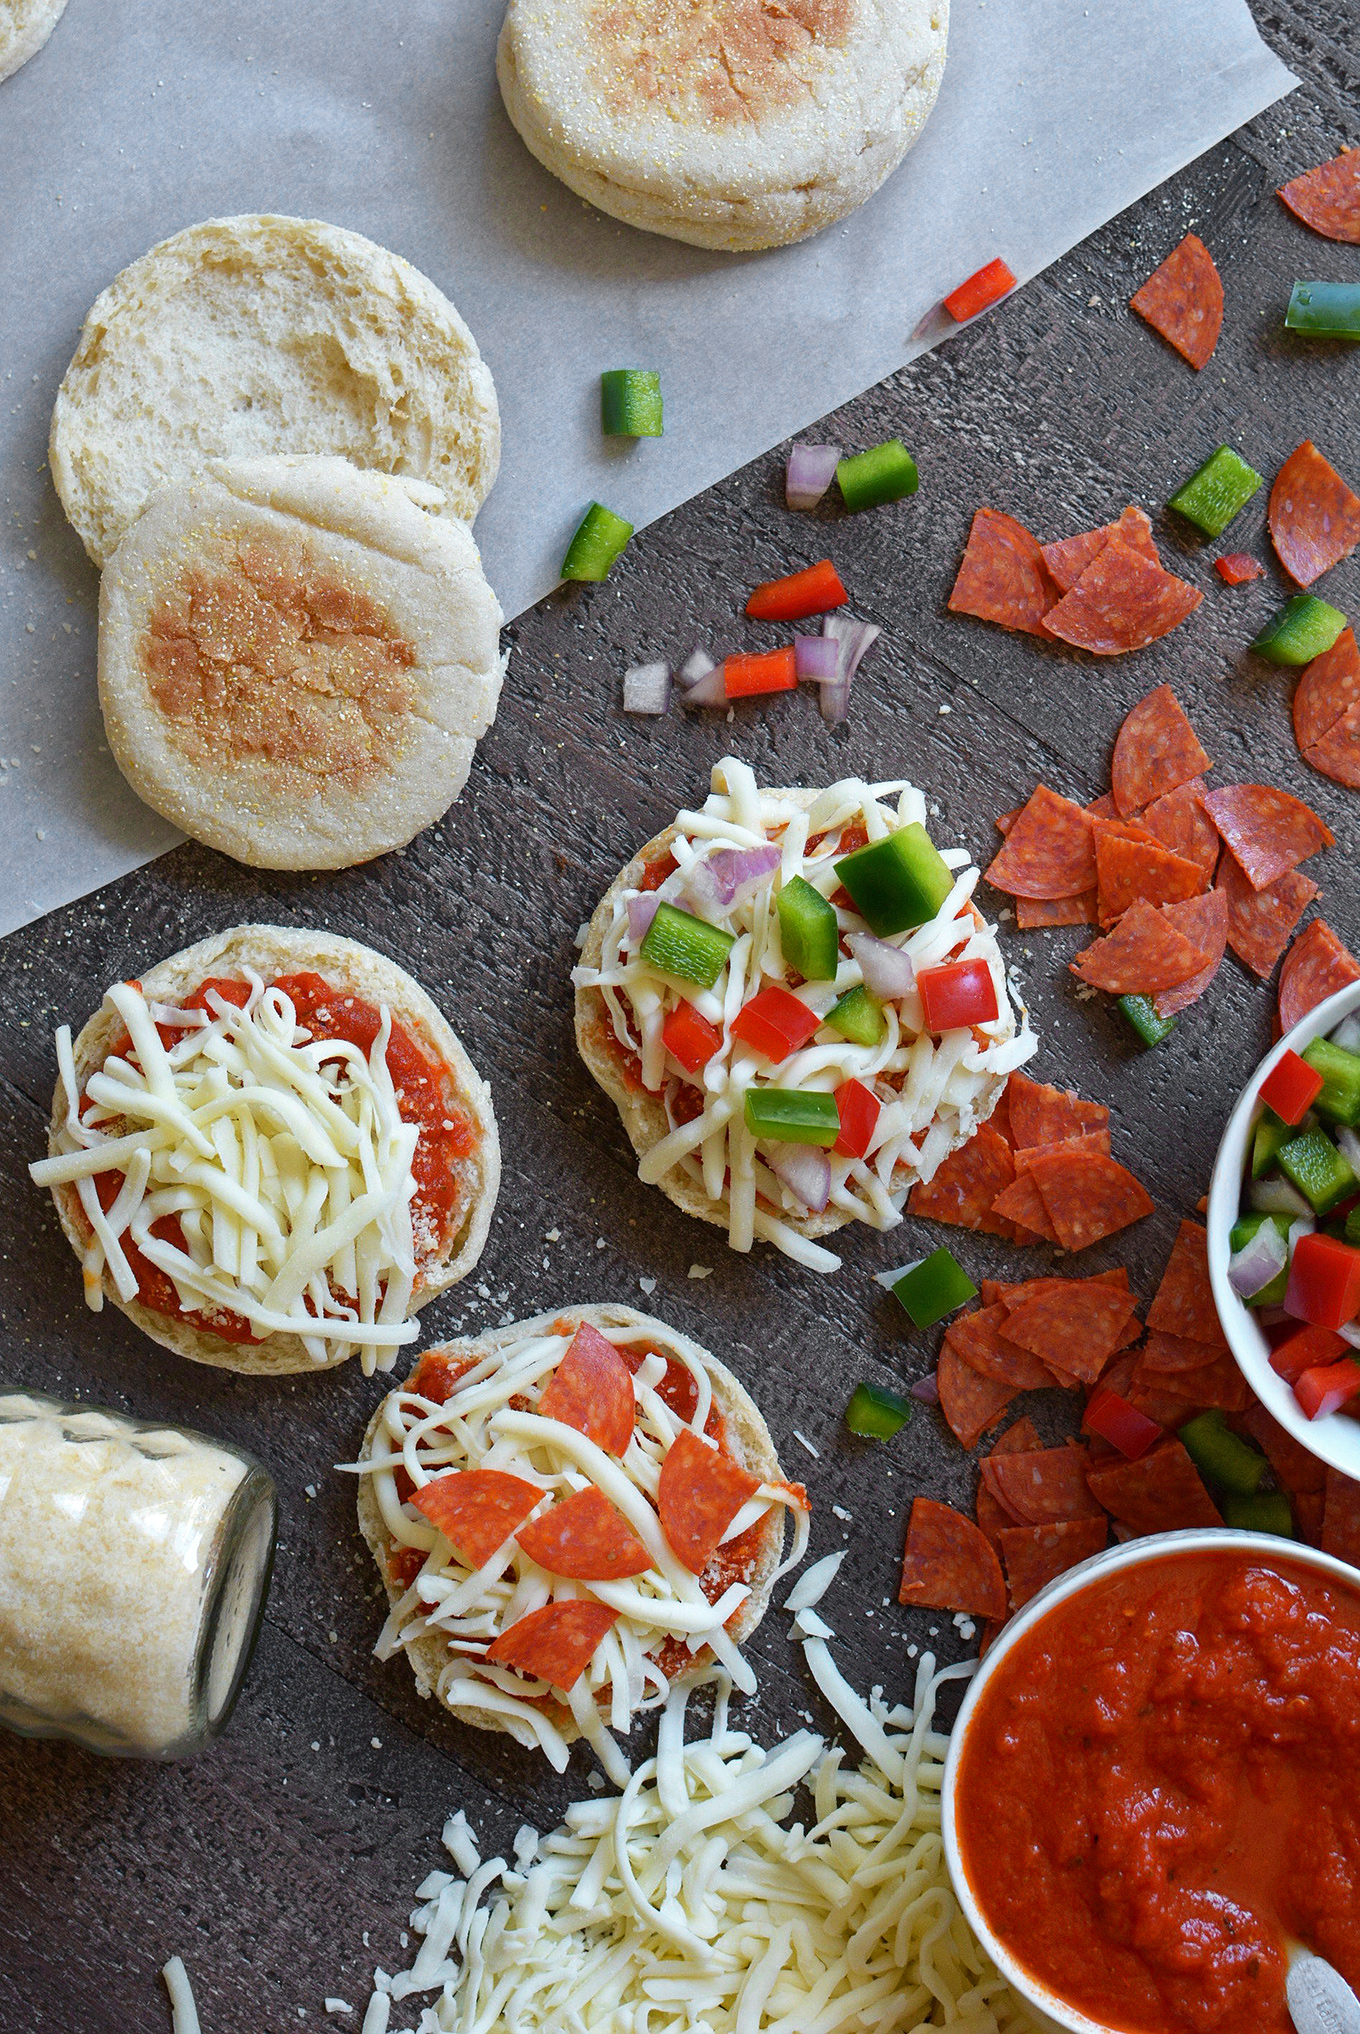 Making English Muffin Mini Pizzas